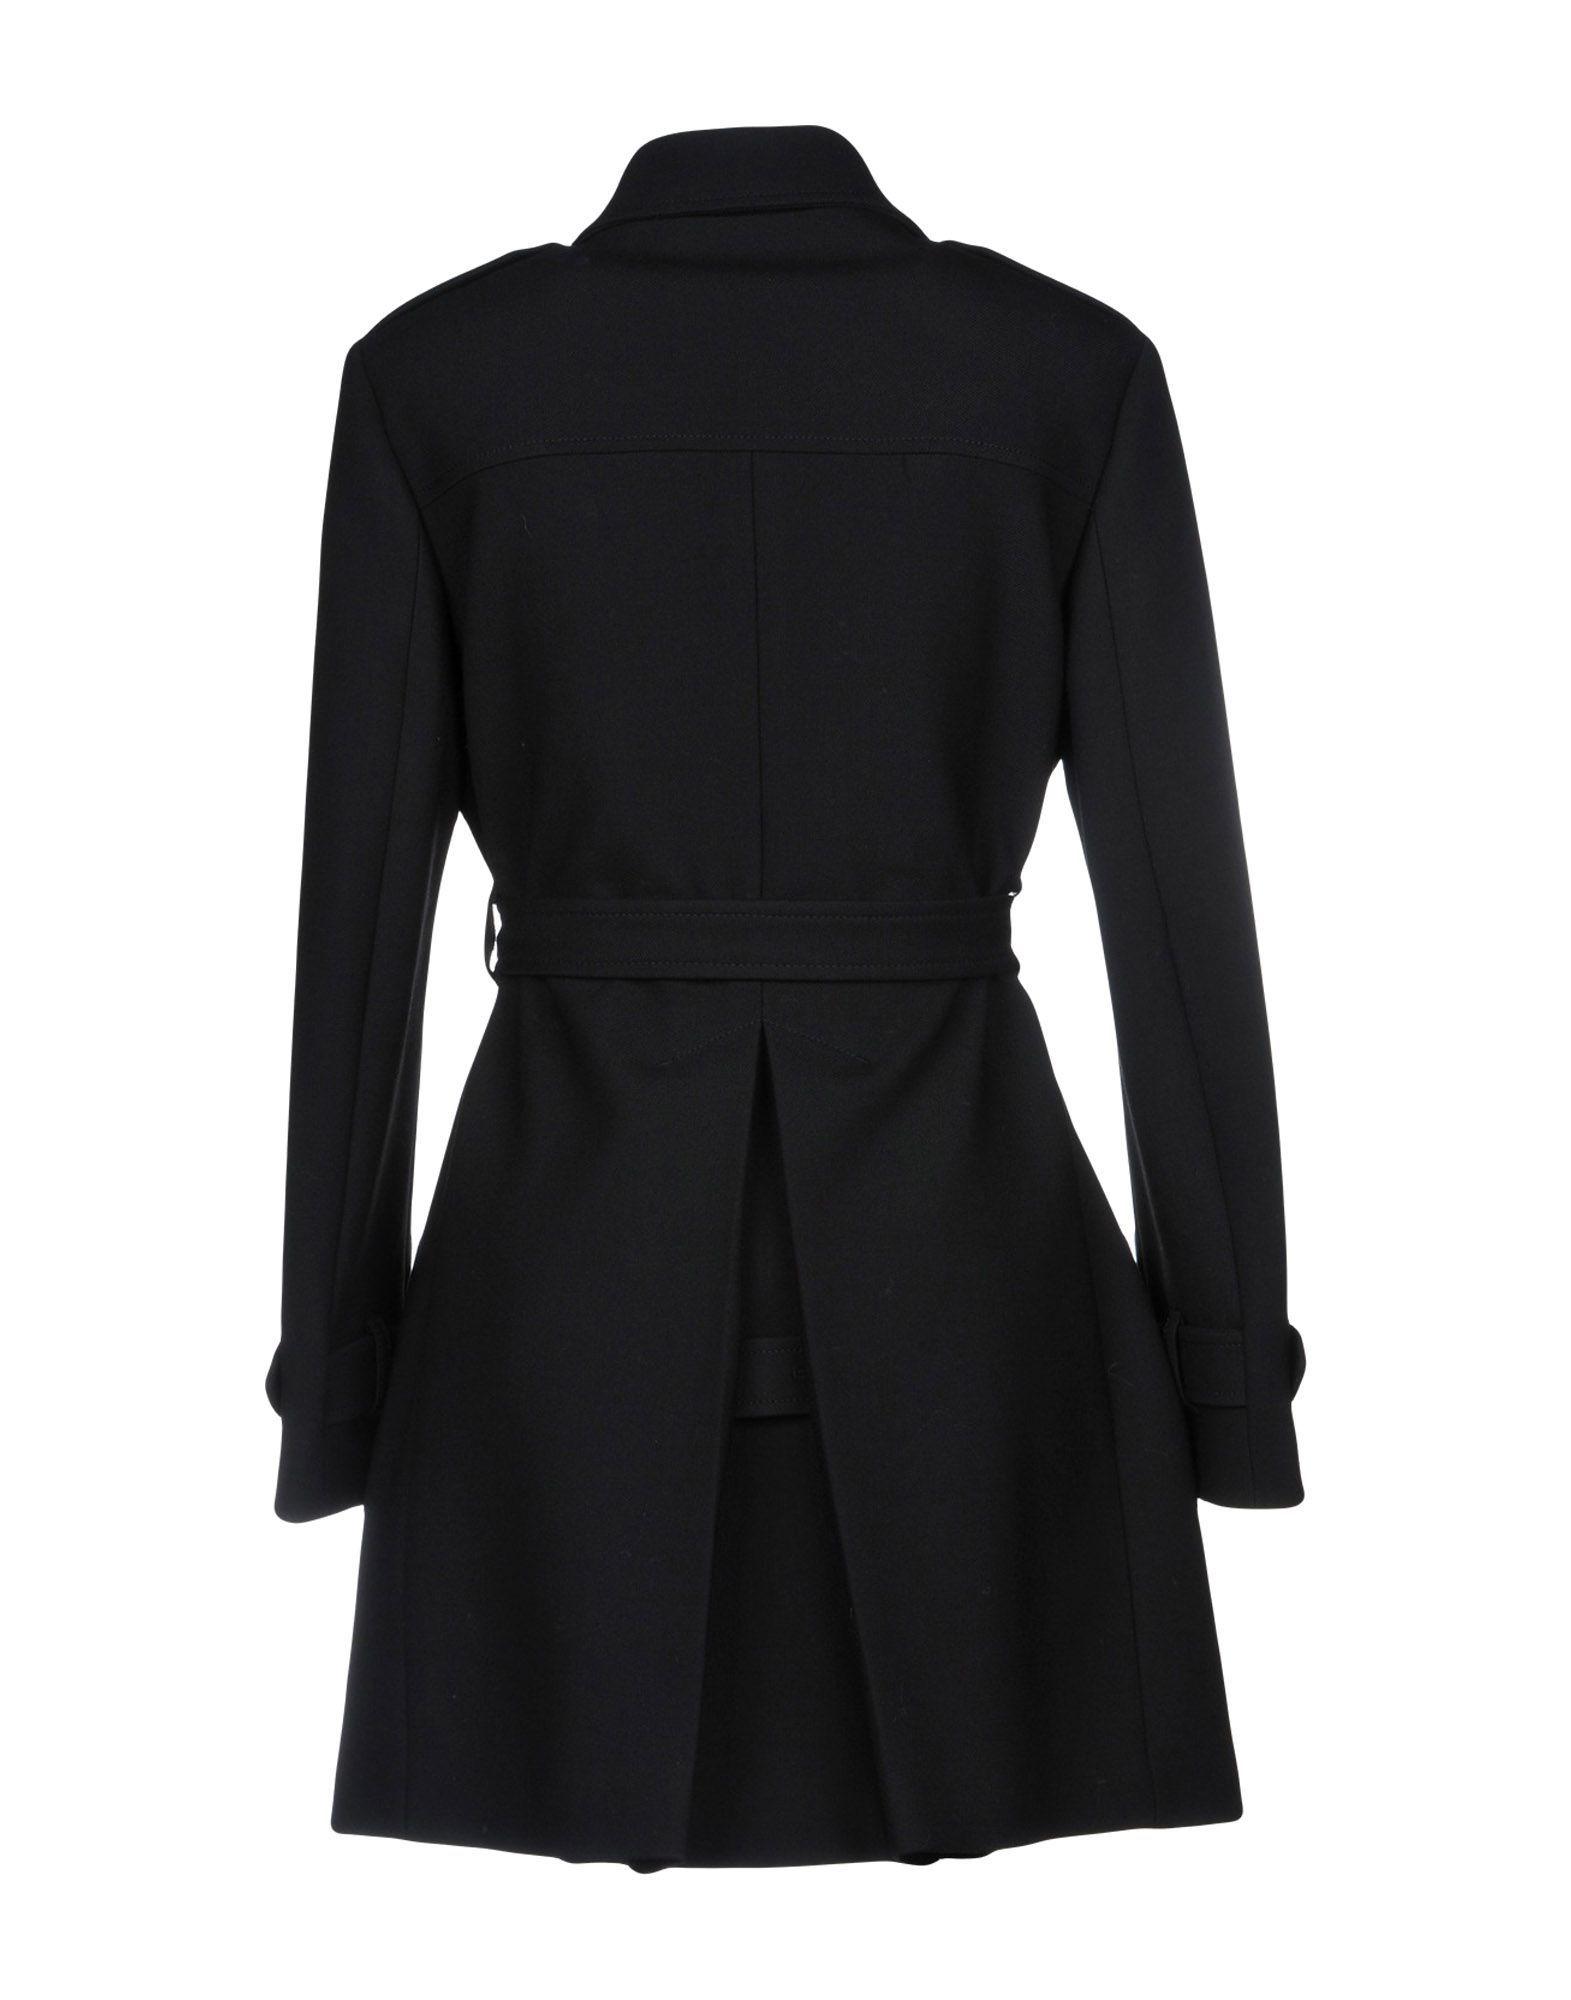 Redvalentino Black Cotton Double Breasted Coat